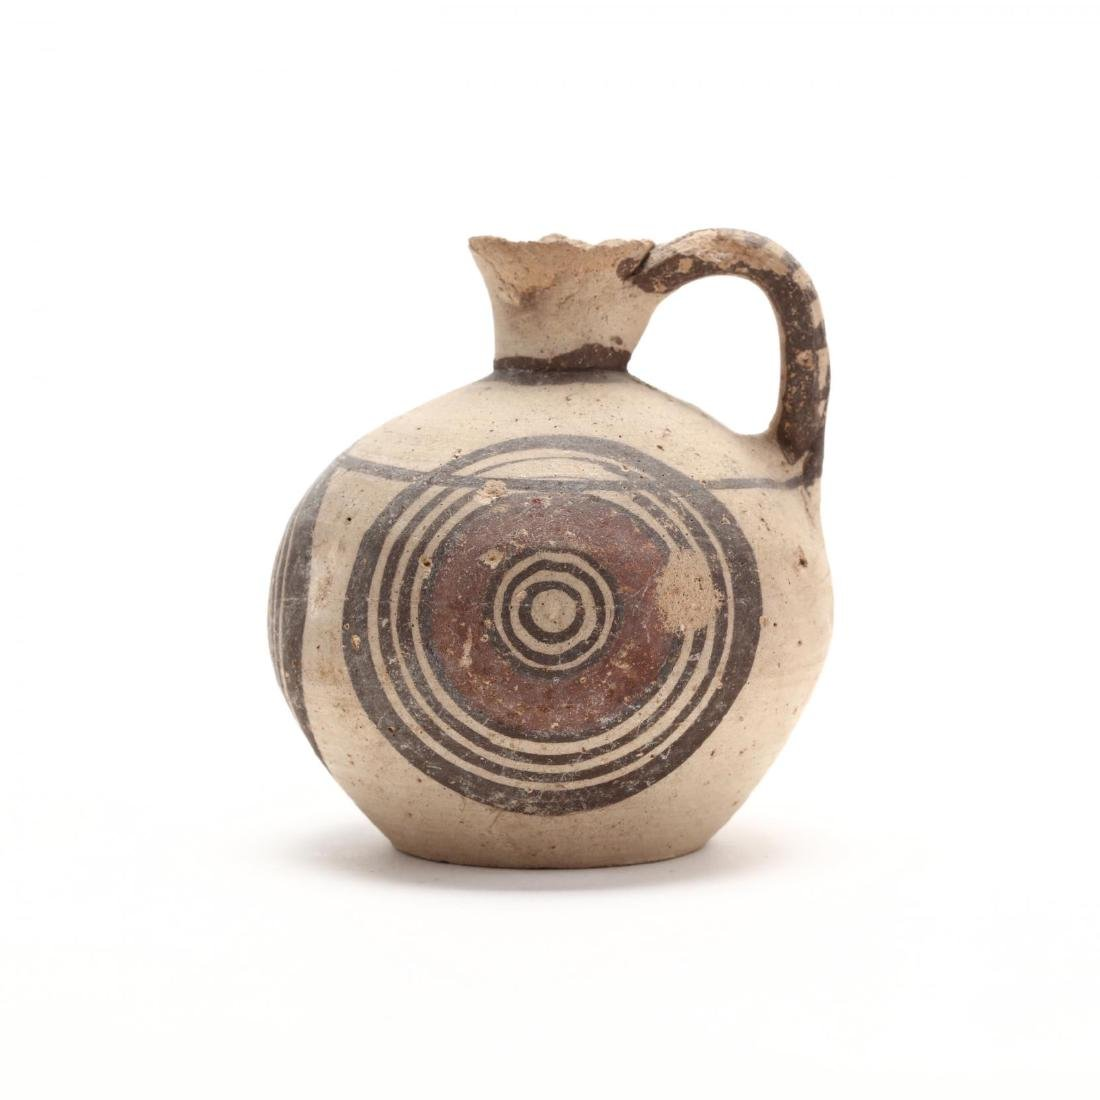 Cypro-Geometric Bichrome Jug, Ex. Eban Collection - 3